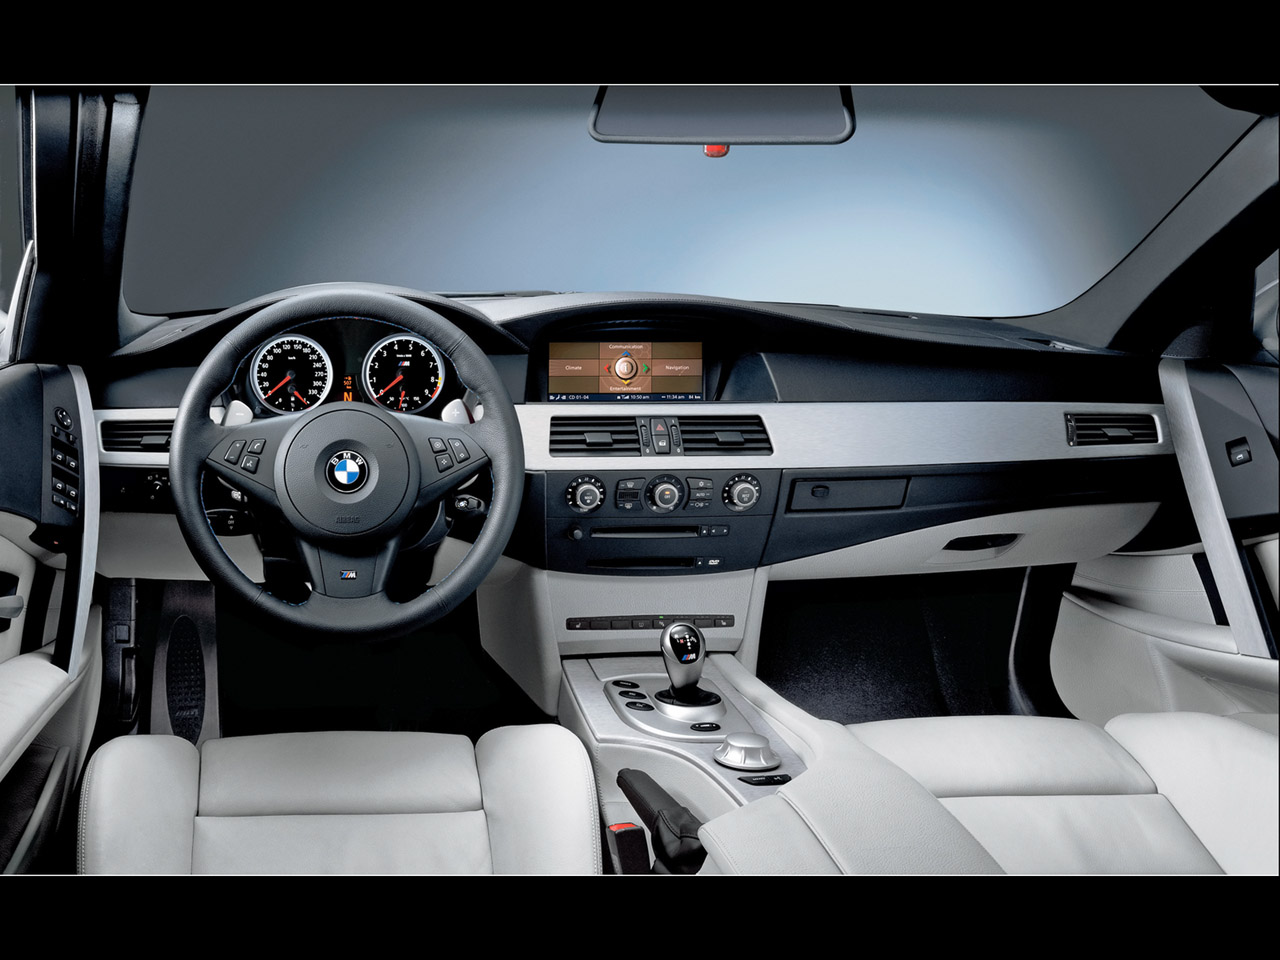 http://2.bp.blogspot.com/-zhxVX2acJ4A/Tnc8p7jbFyI/AAAAAAAAAE0/LHLqCb9QdOY/s1600/interior-BMW-M5-Pictures-Wallpaper.jpg